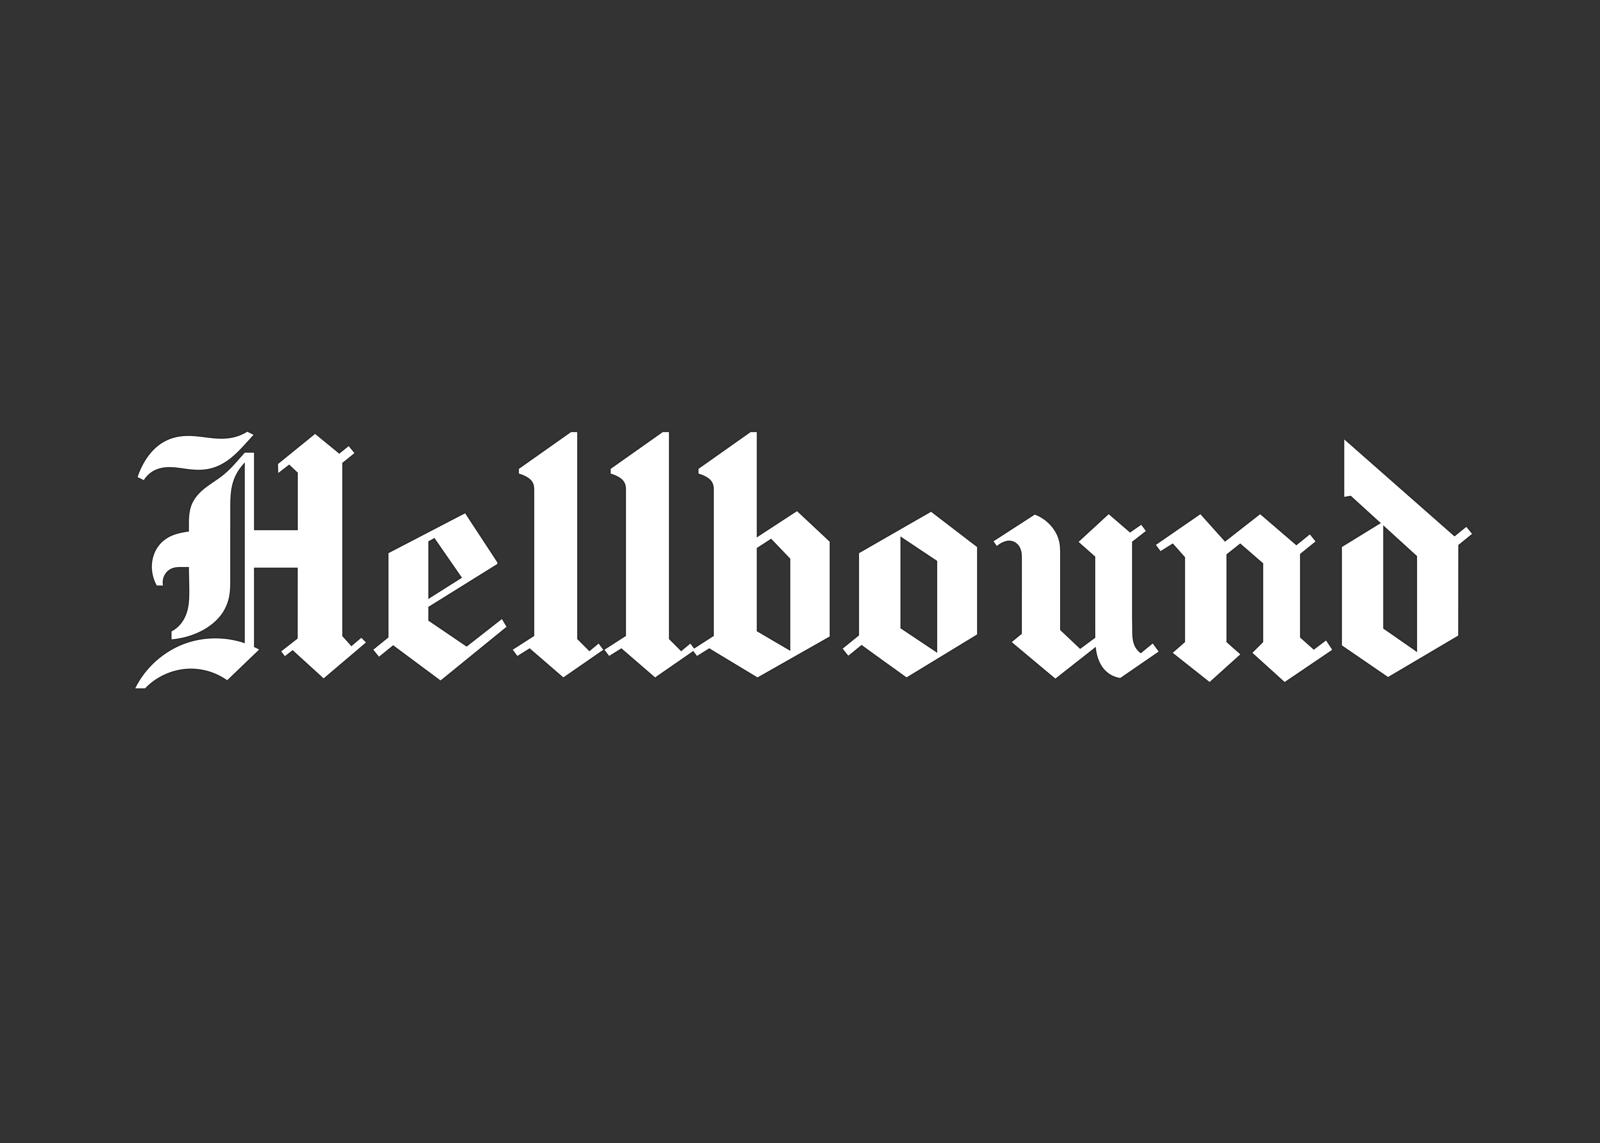 Hellbound Print